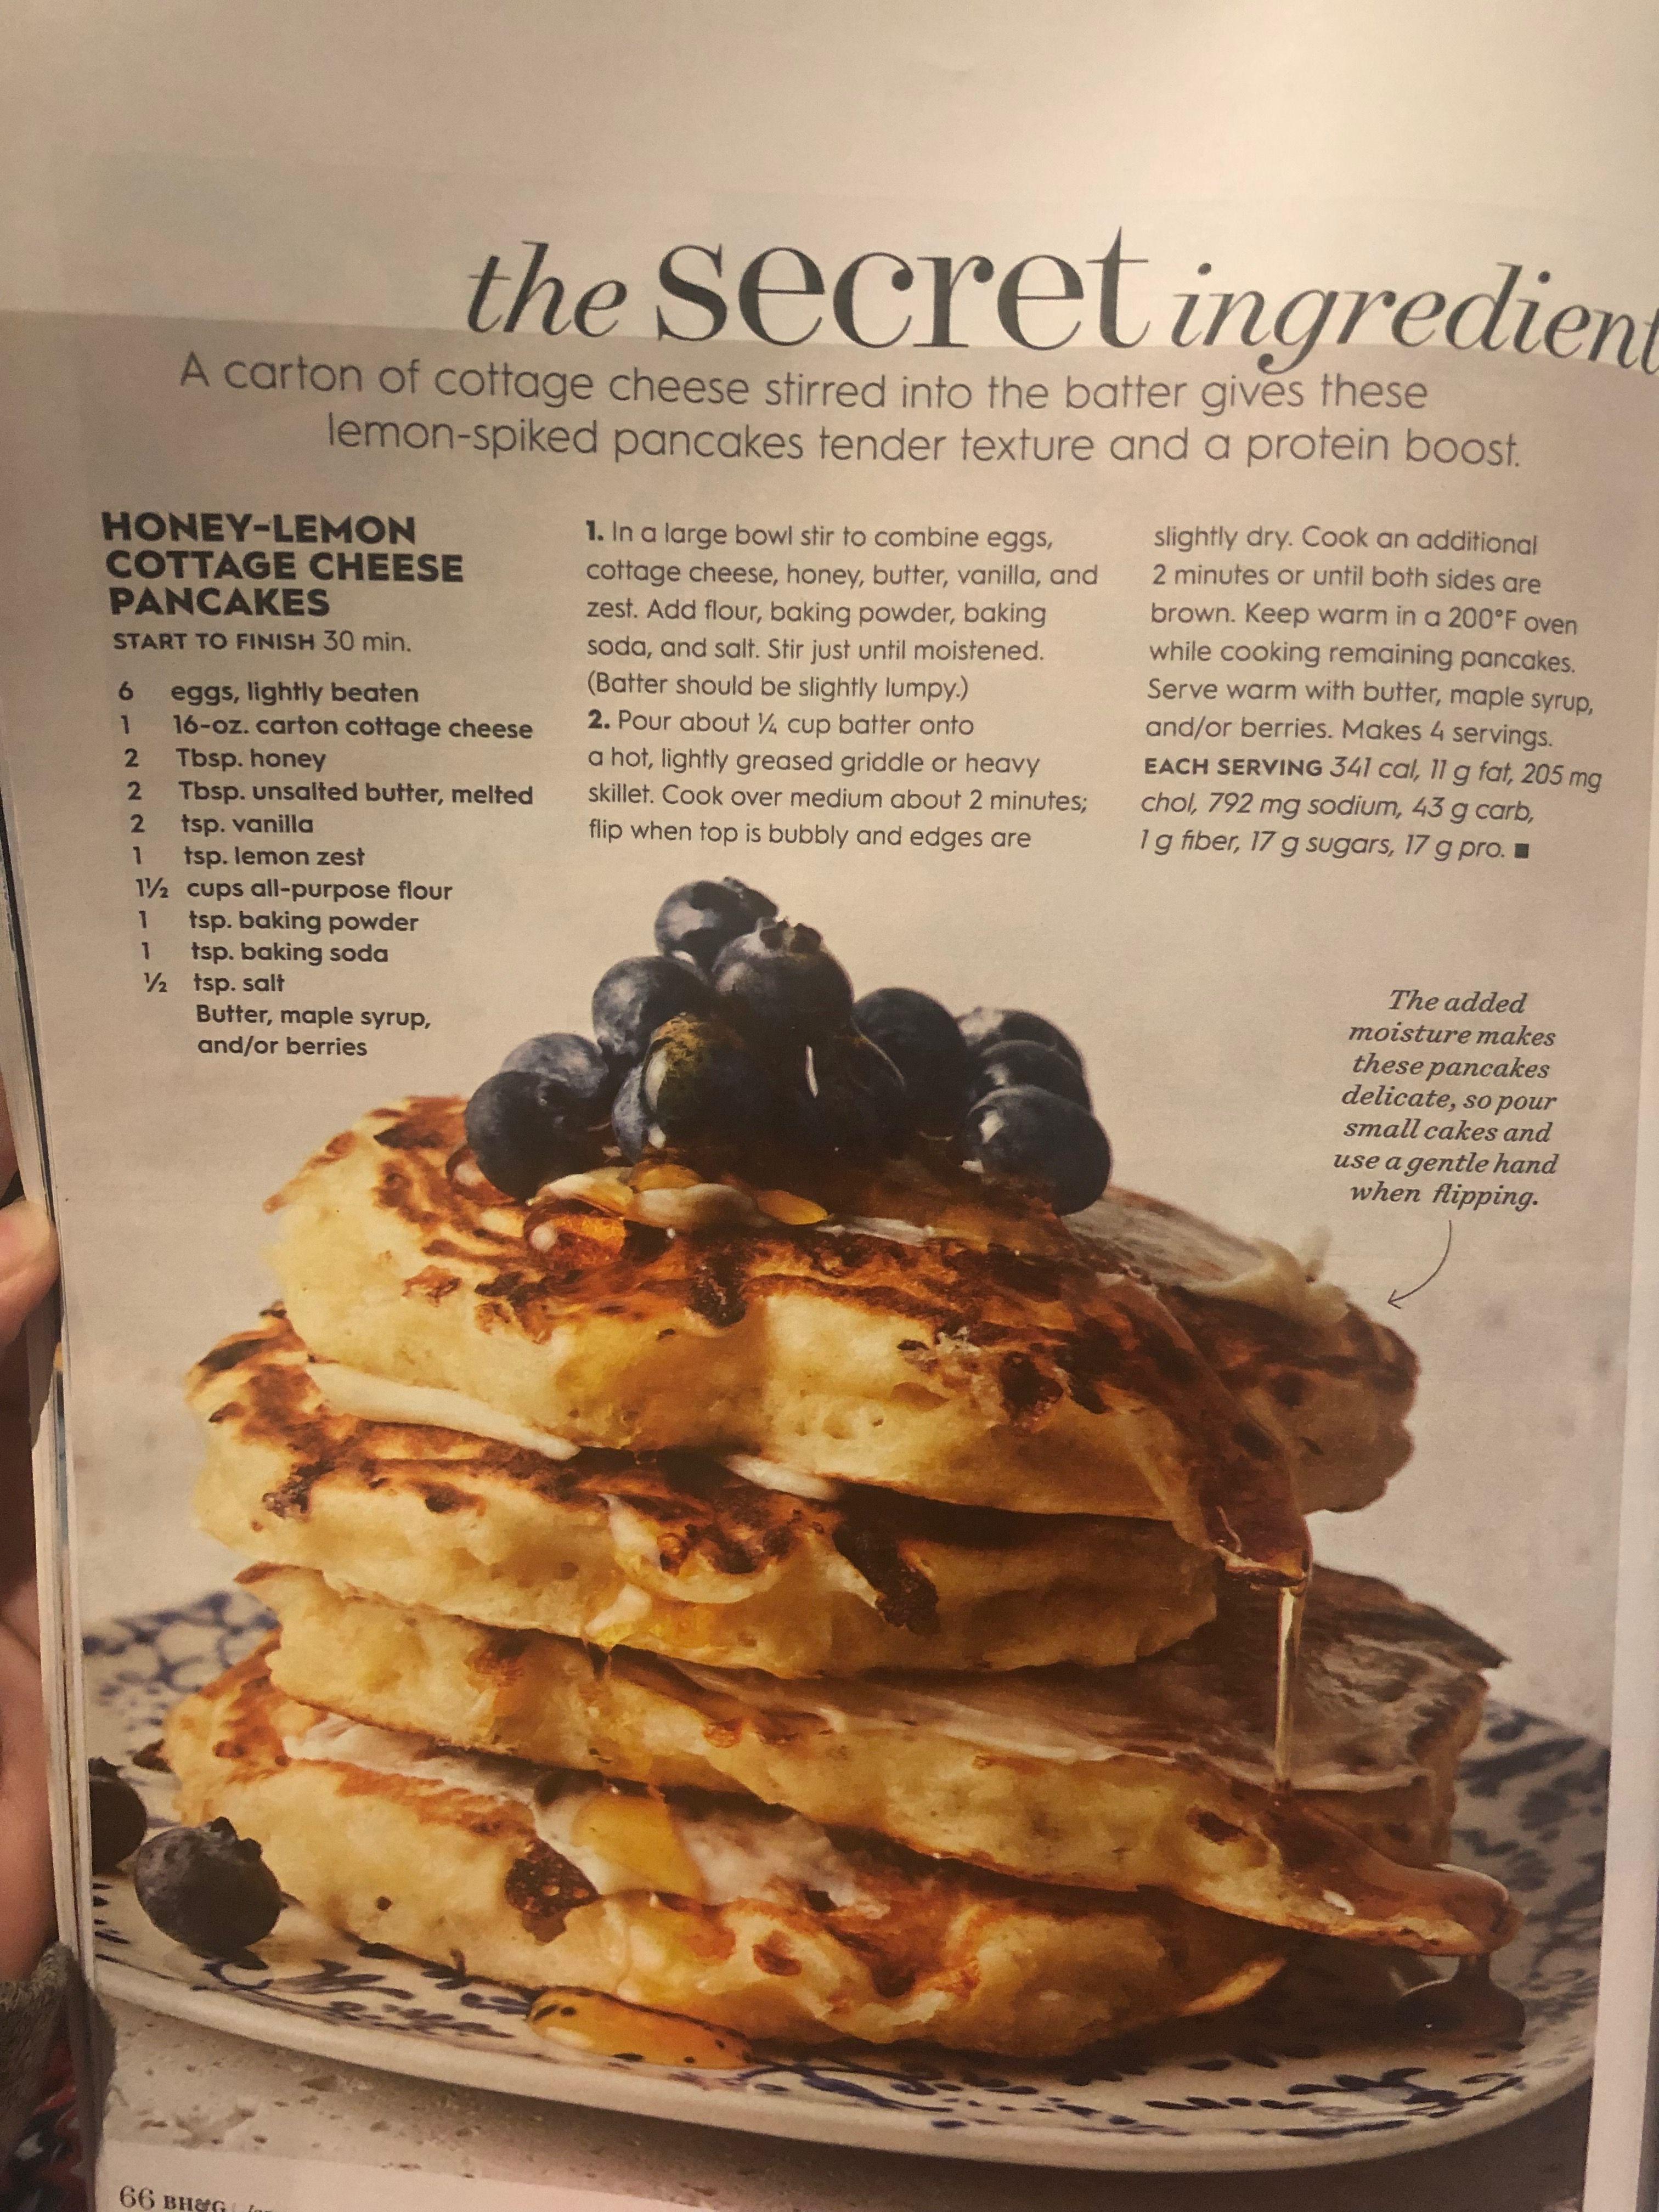 Honey Lemon Cottage Cheese Pancakes Recipe Good Housekeeping January 2019 Cottage Cheese Pancakes Cheese Pancakes Homemade Recipes